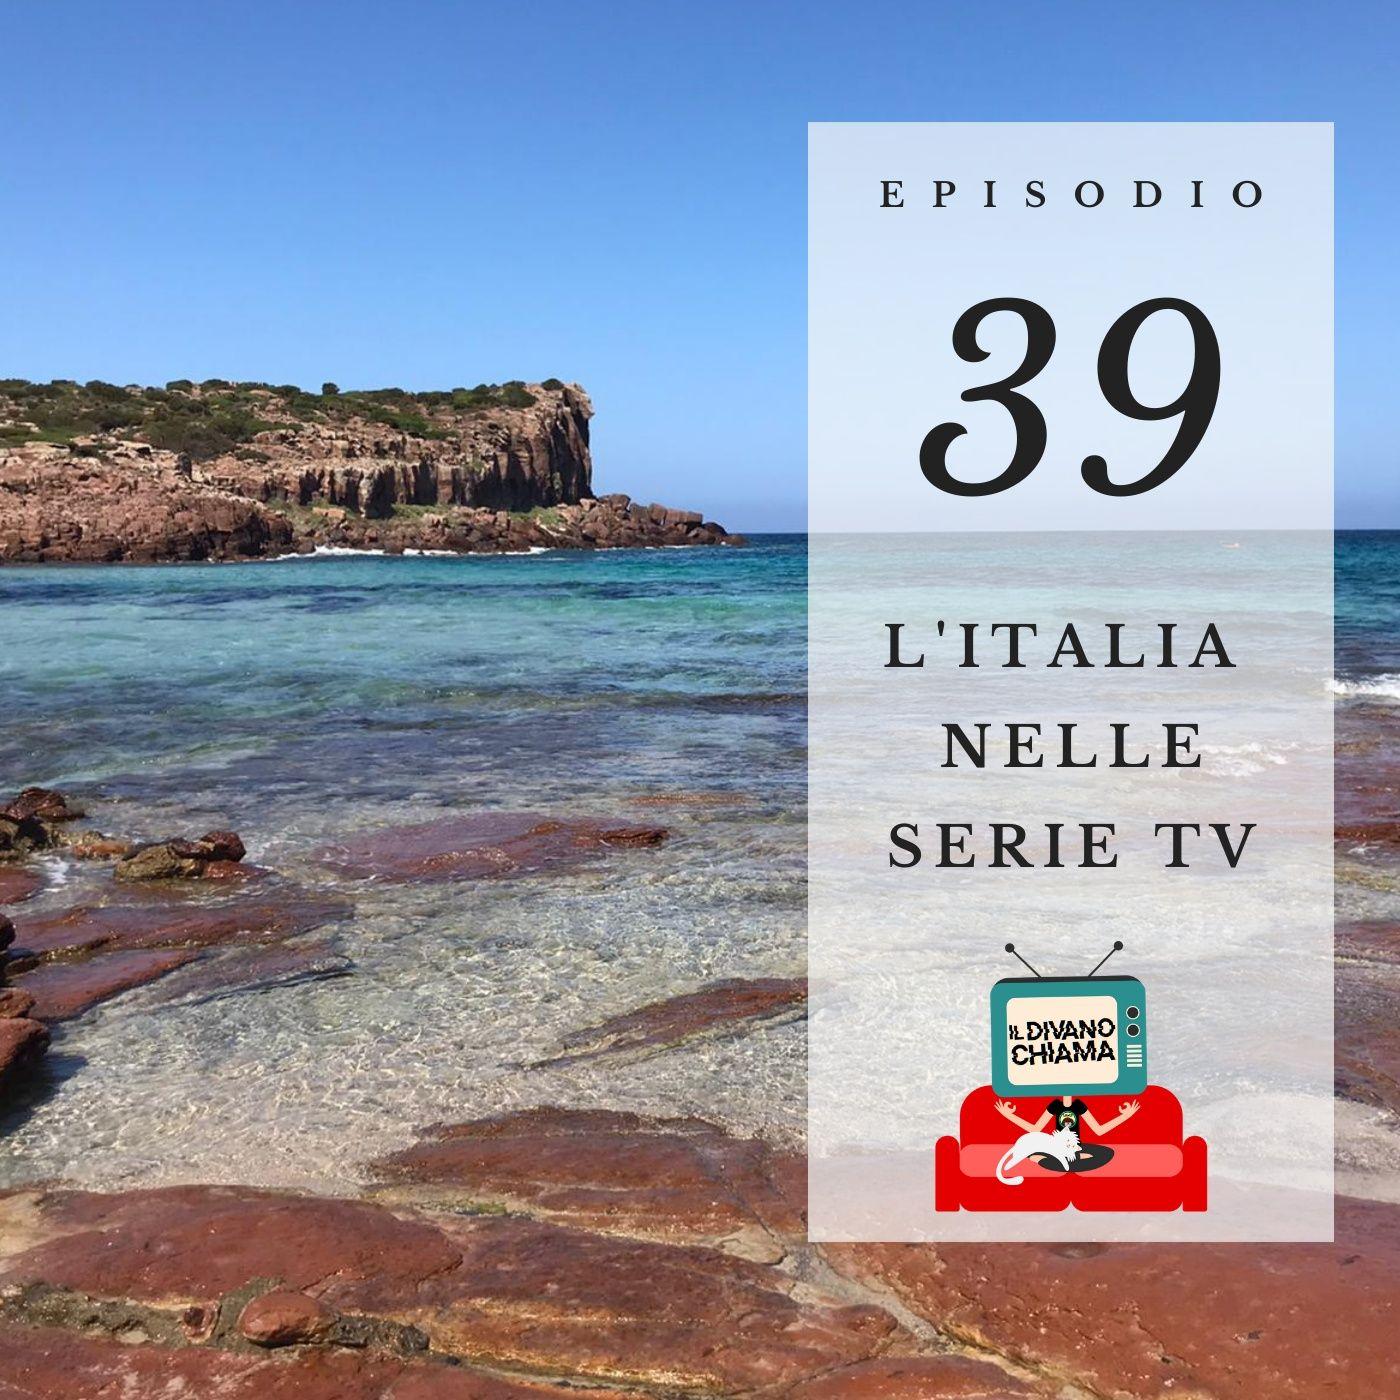 Puntata 39 - L'Italia nelle serie TV